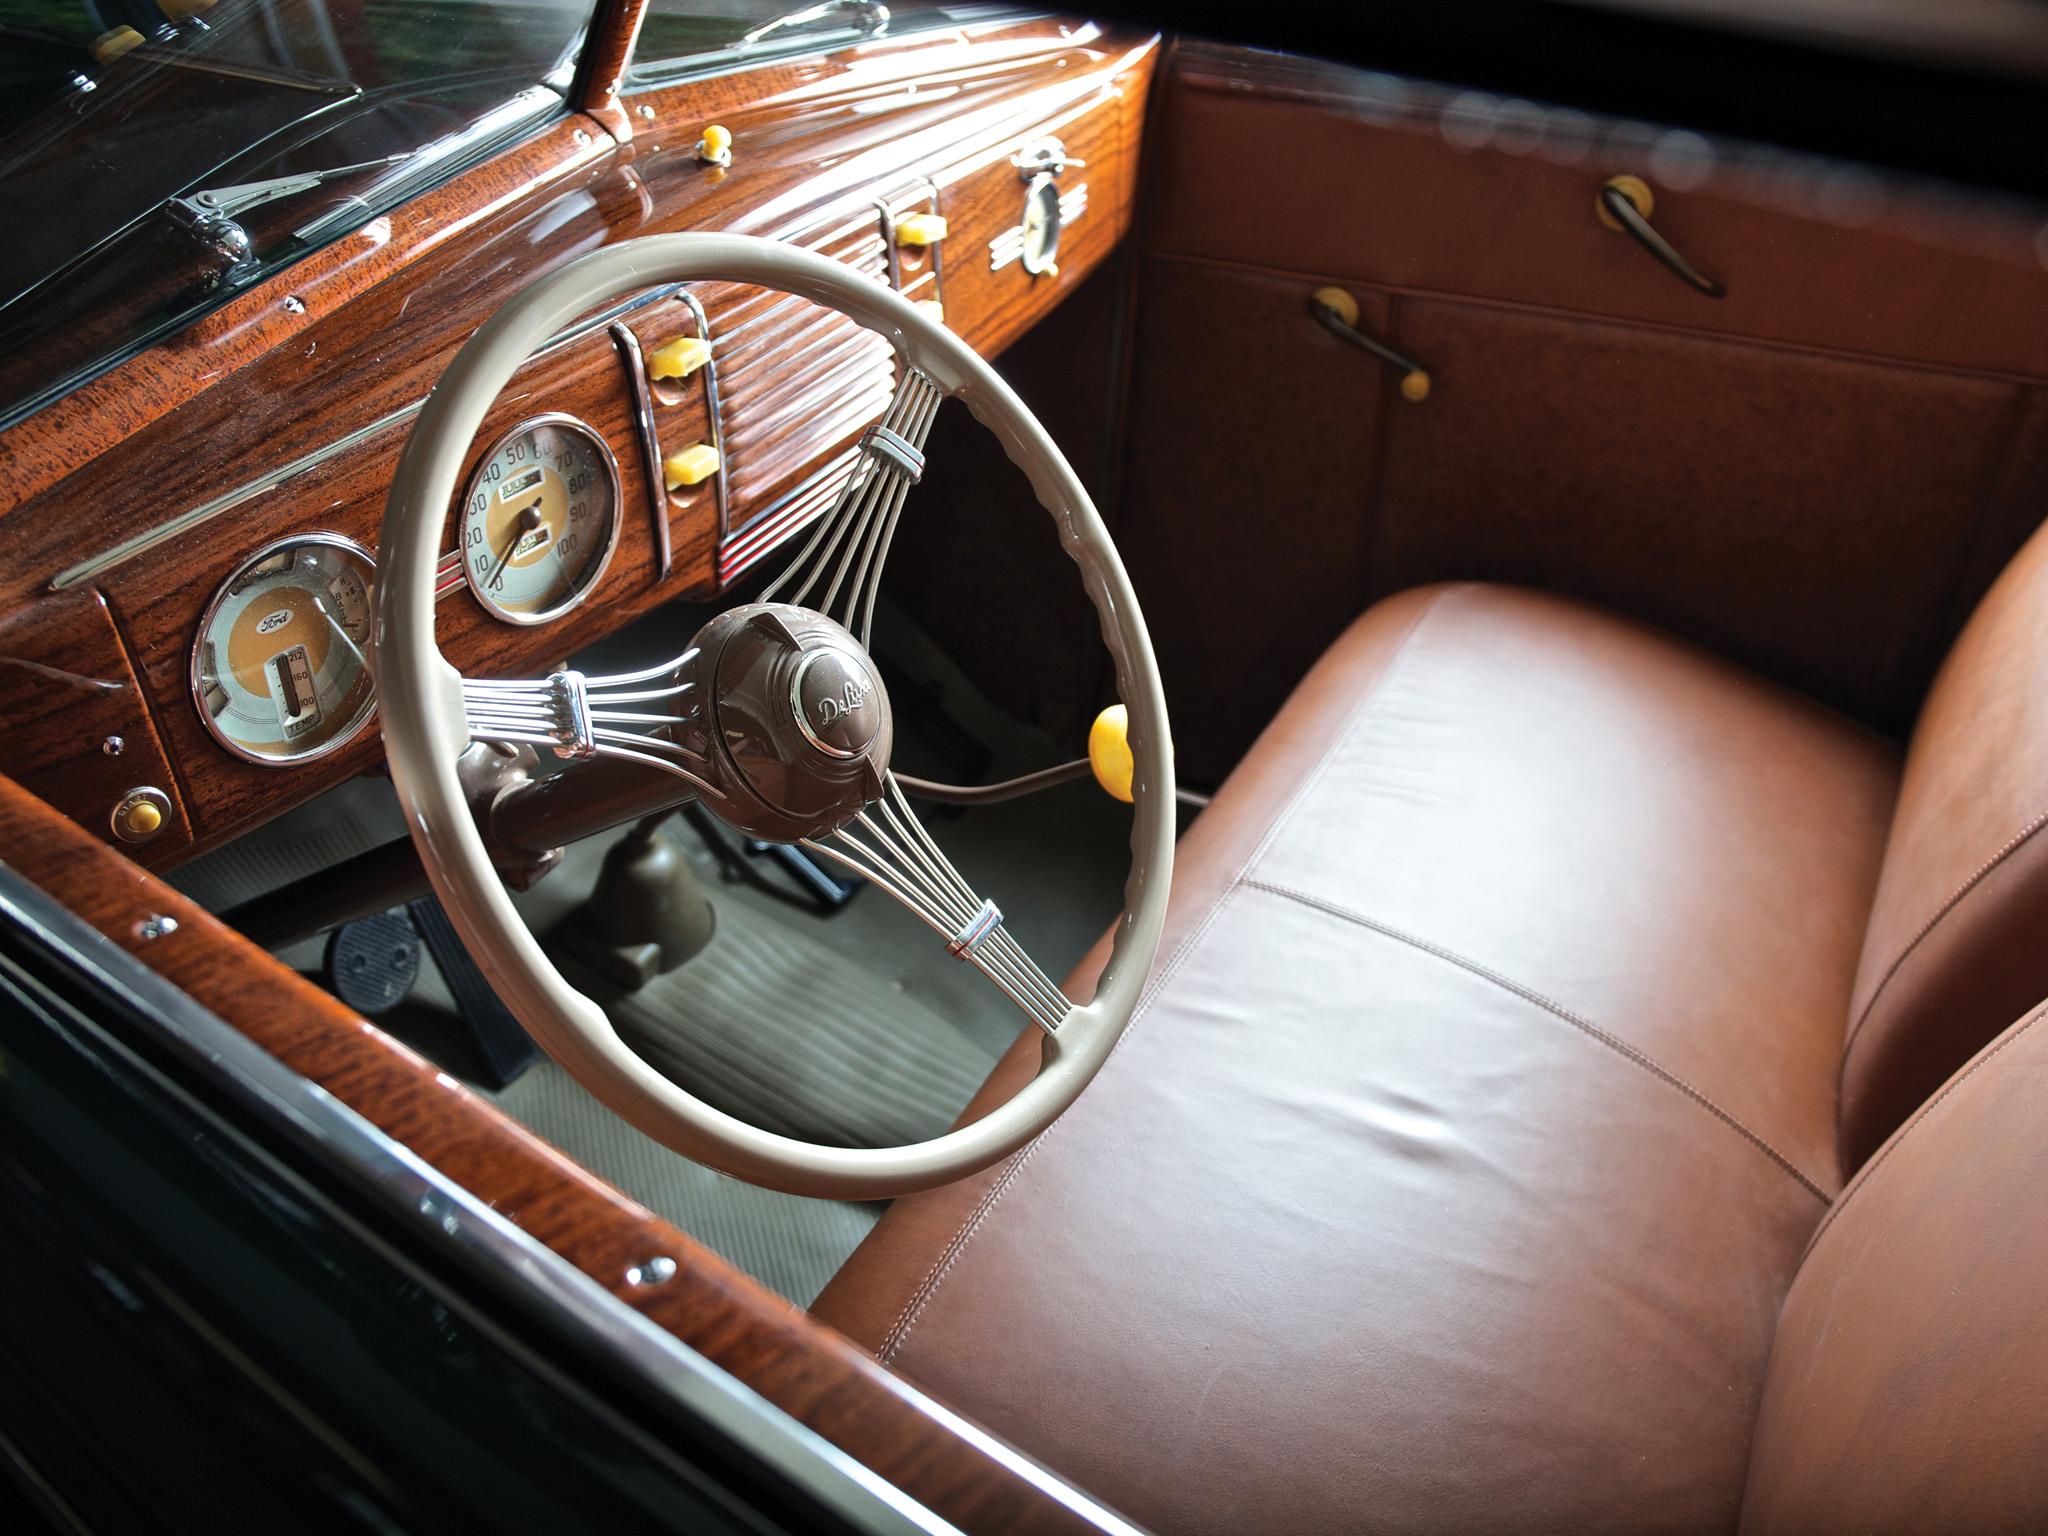 1939 ford v8 deluxe convertible coupe retro v 8 interior wallpaper 2048x1536 115542 wallpaperup